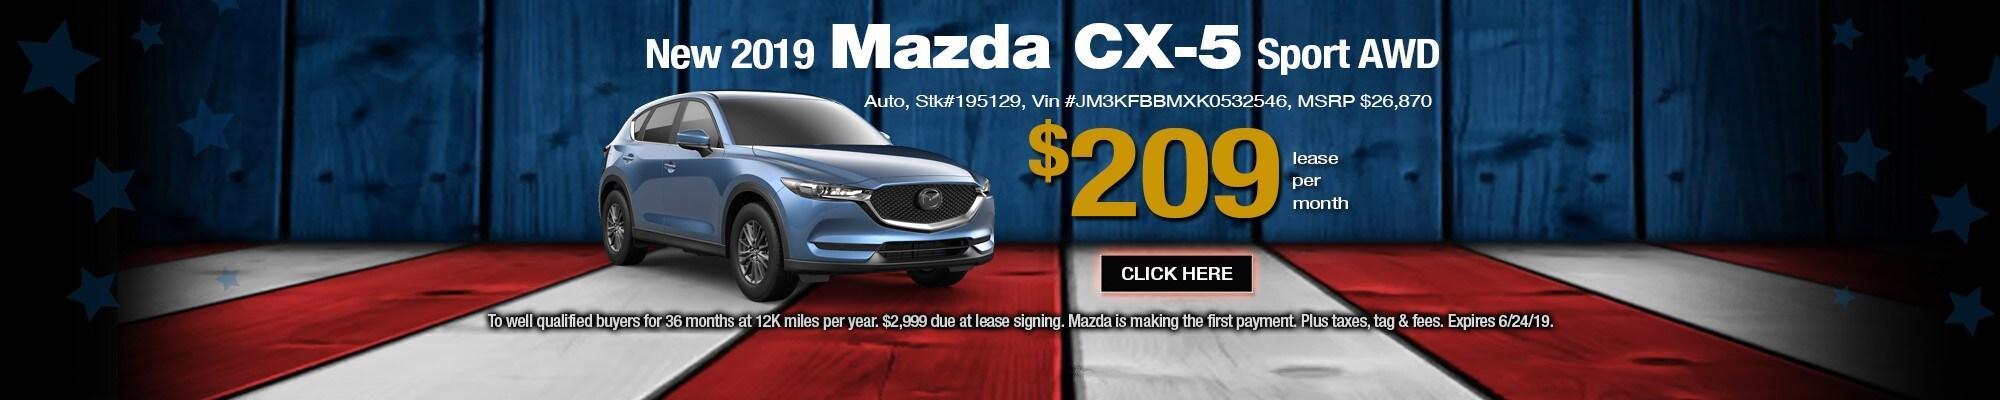 Piazza Mazda Of Reading >> Piazza Mazda of Reading: Mazda Dealership Reading PA ...